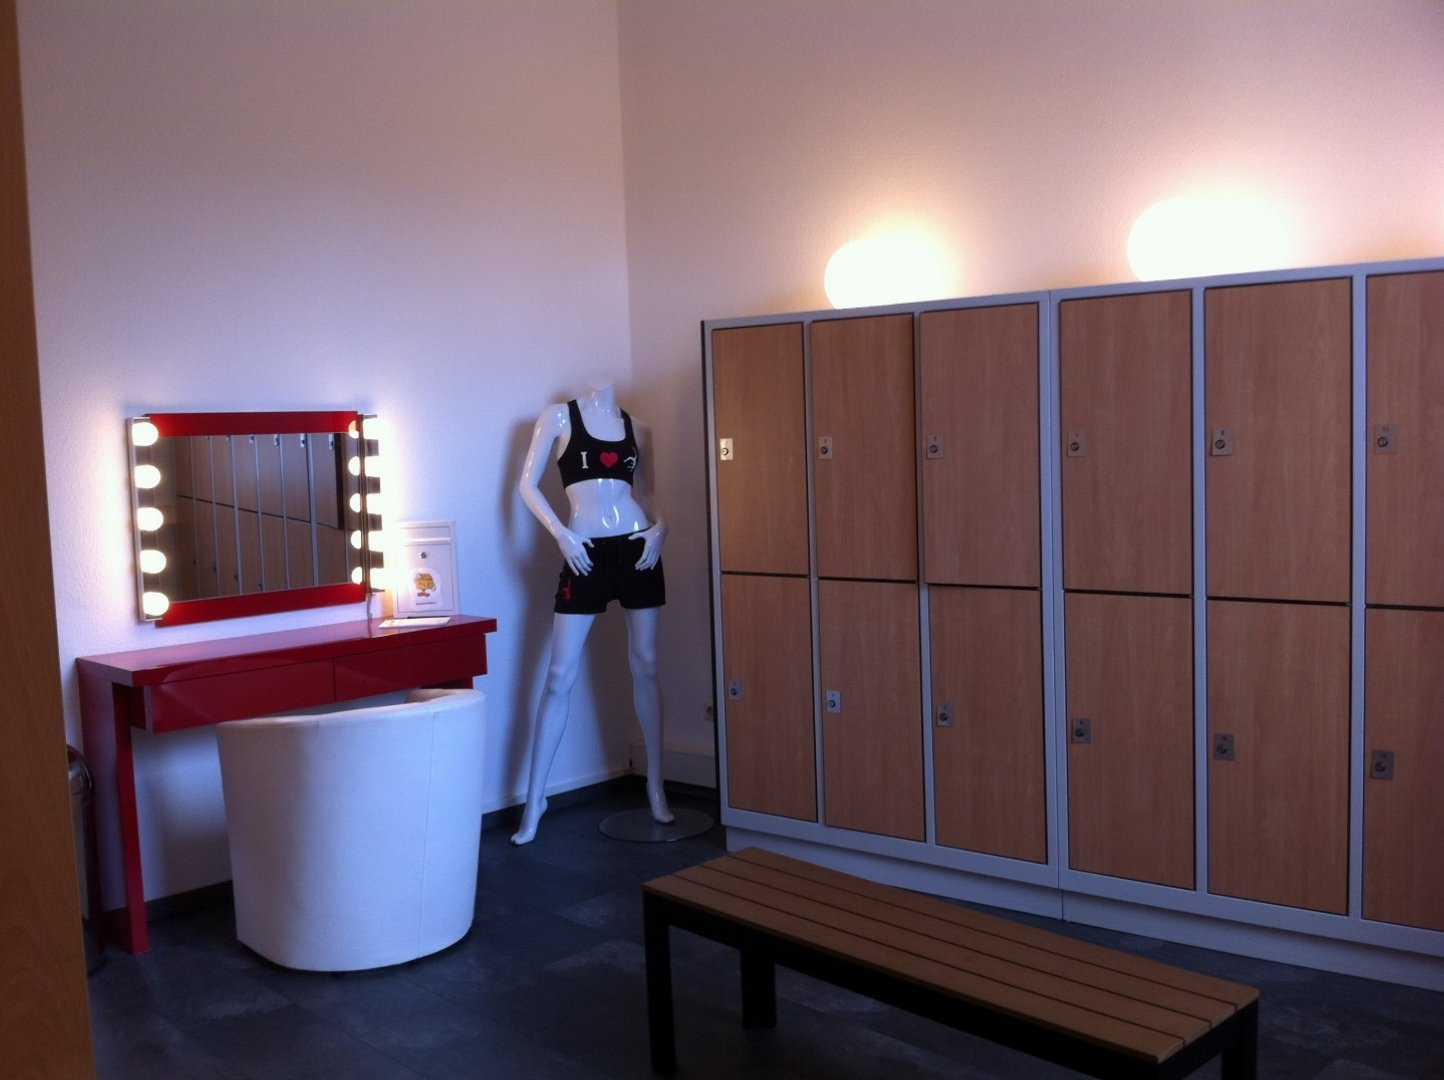 VI-Dance GmbH Studio Dortmund  in 44135 Dortmund